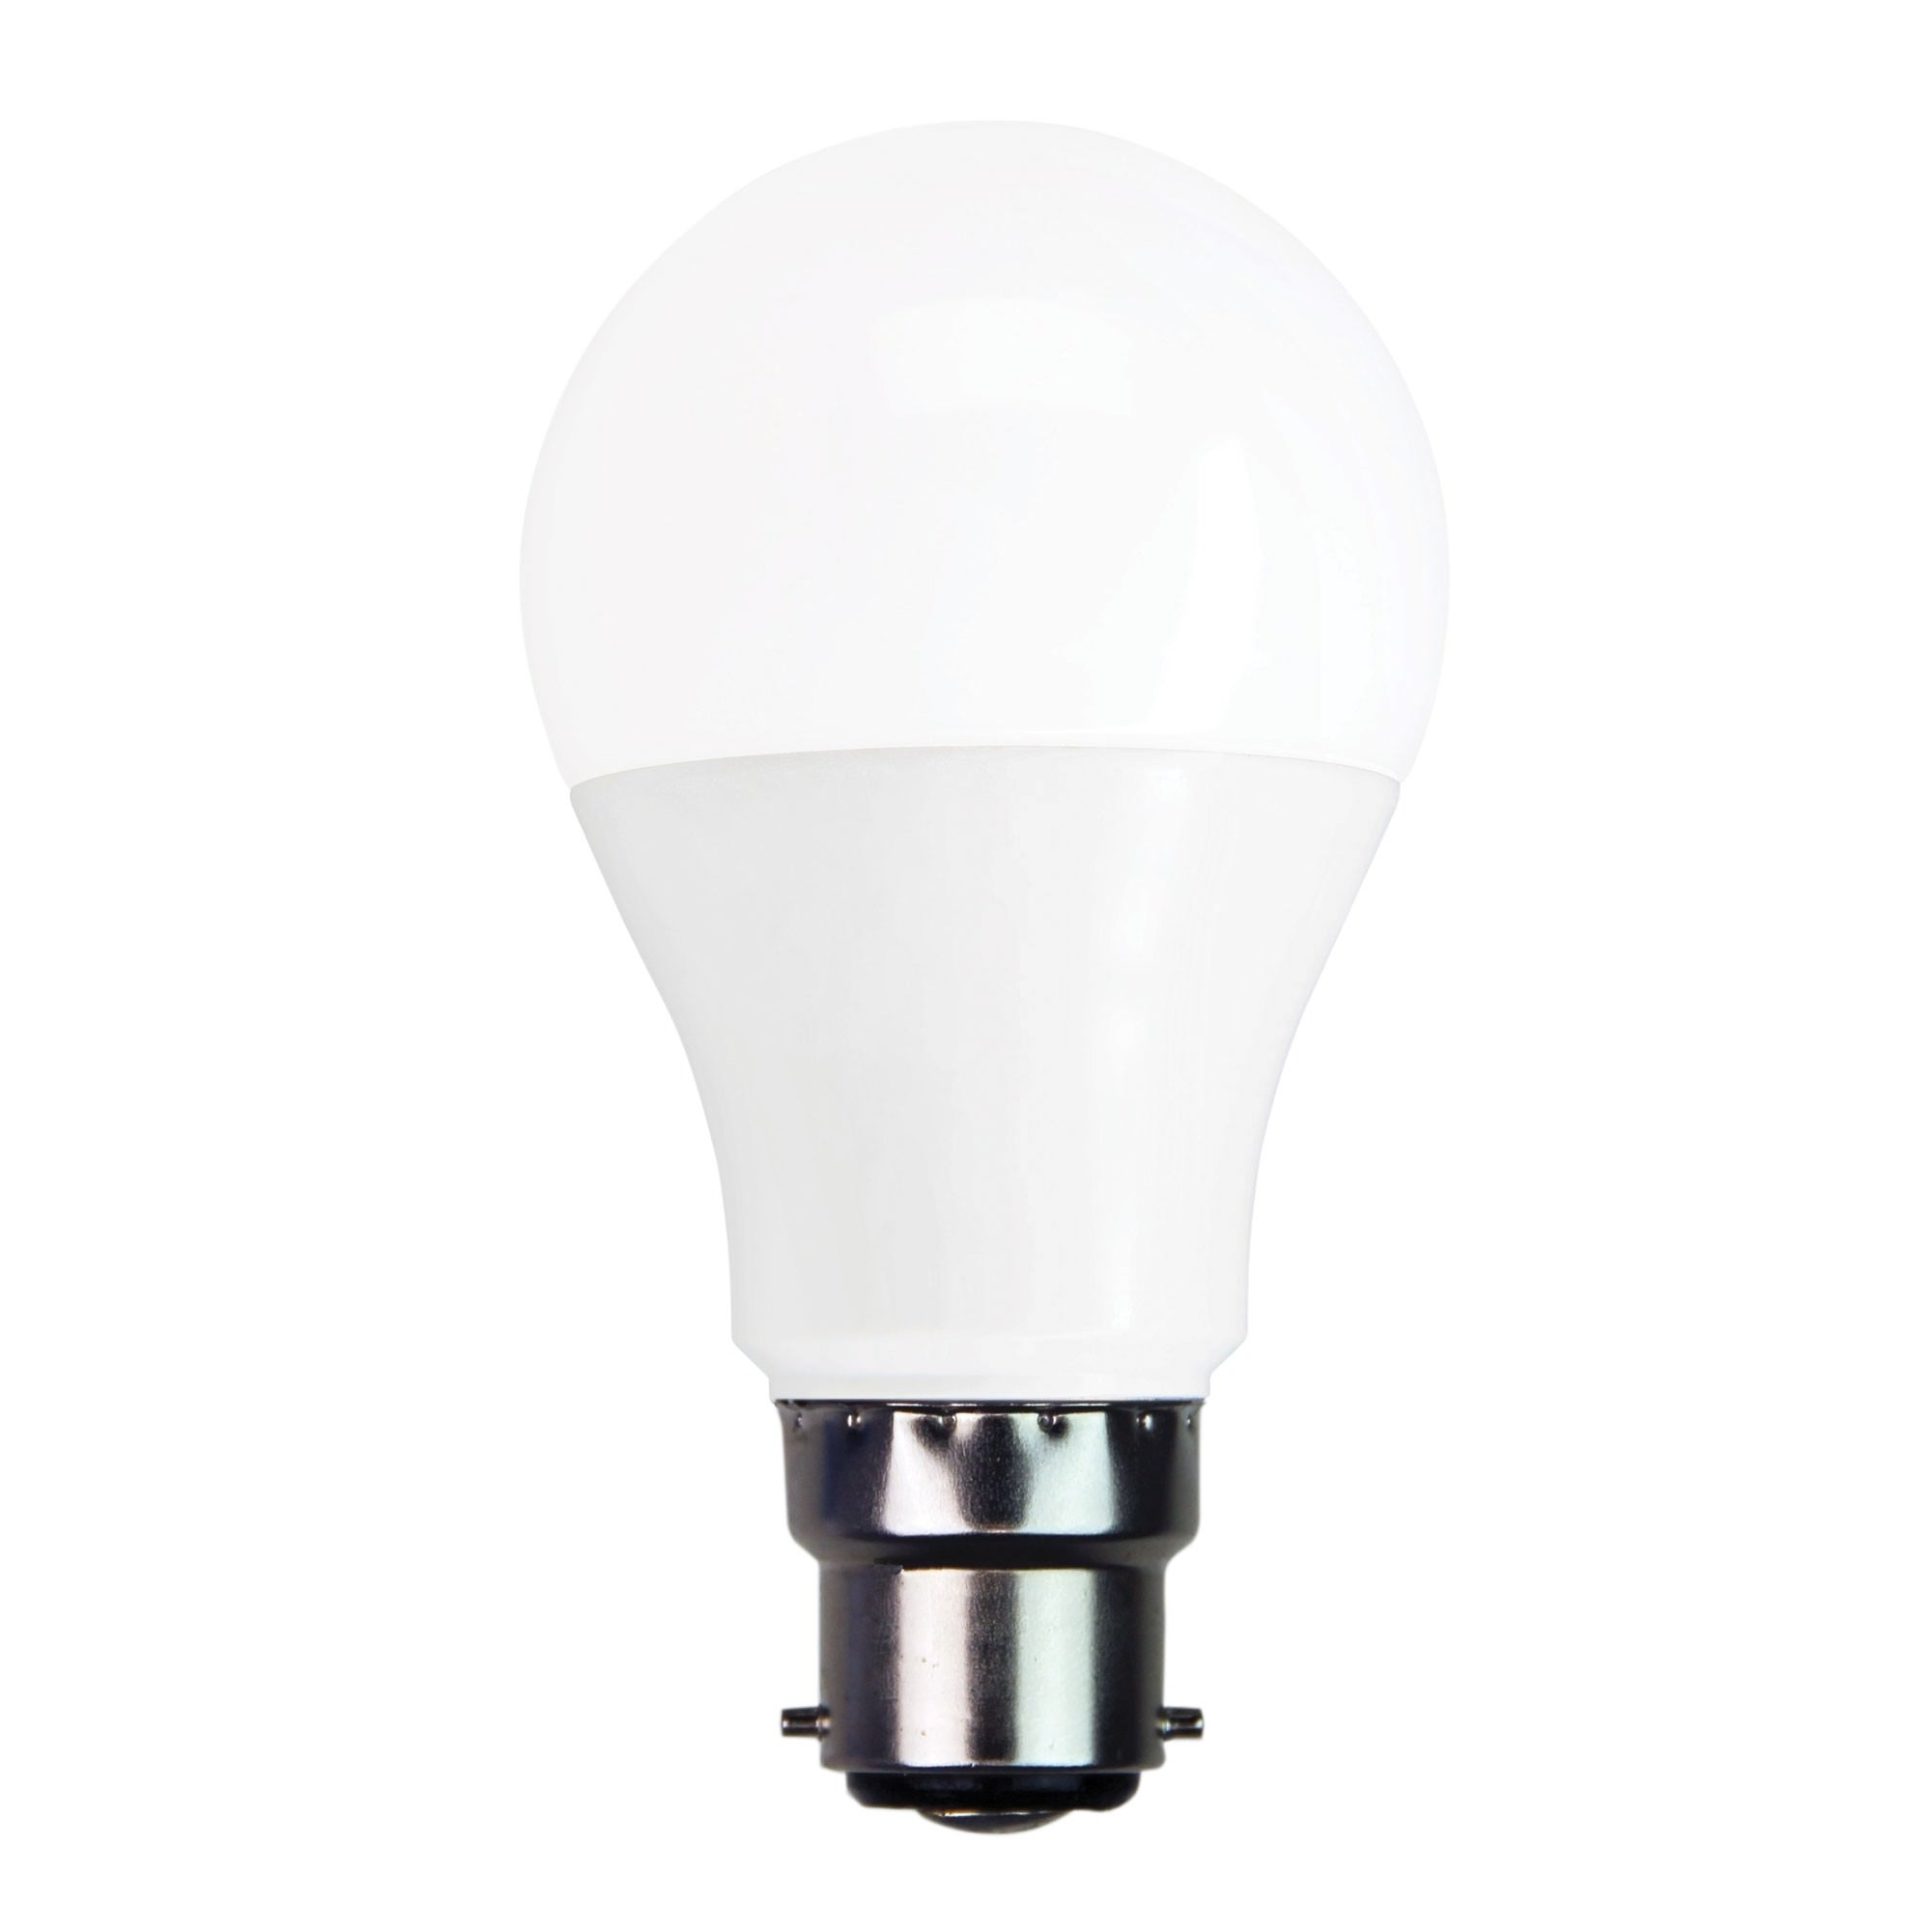 Allume LED Globe, 9W, B22, 4000K, GLS Shape